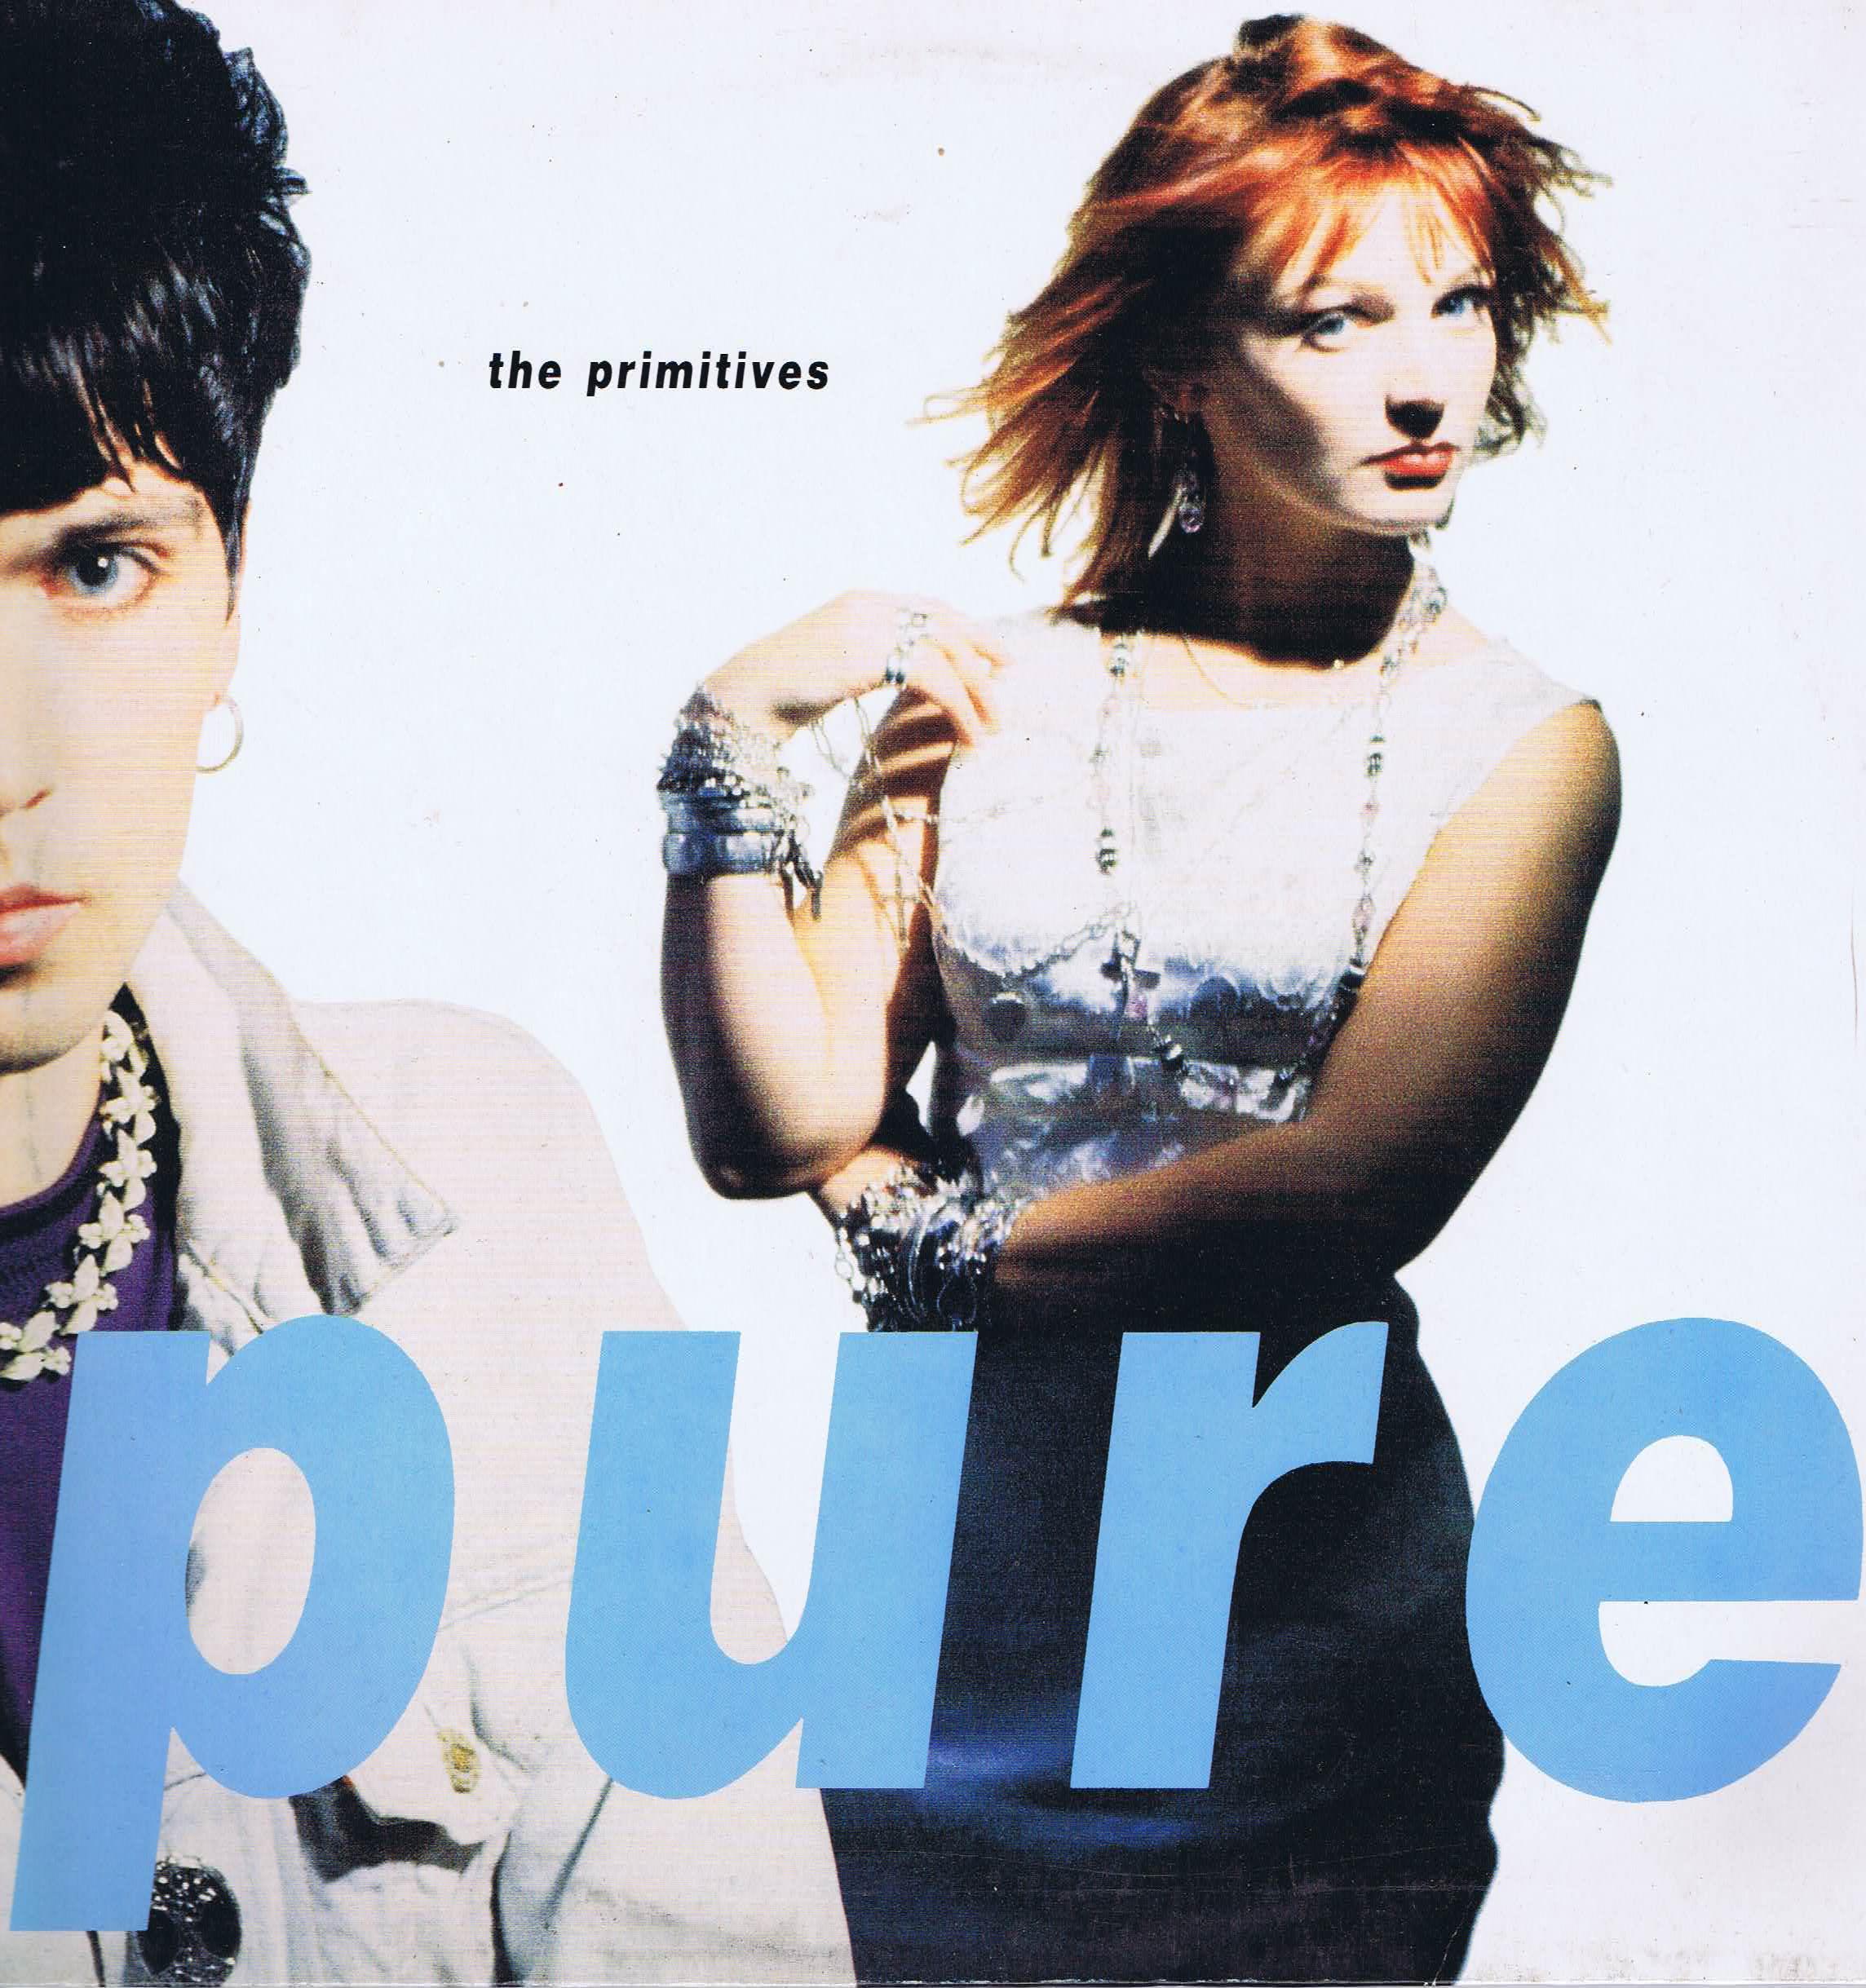 The Primitives Pure Pl 74252 A1 B1 Lp Vinyl Record